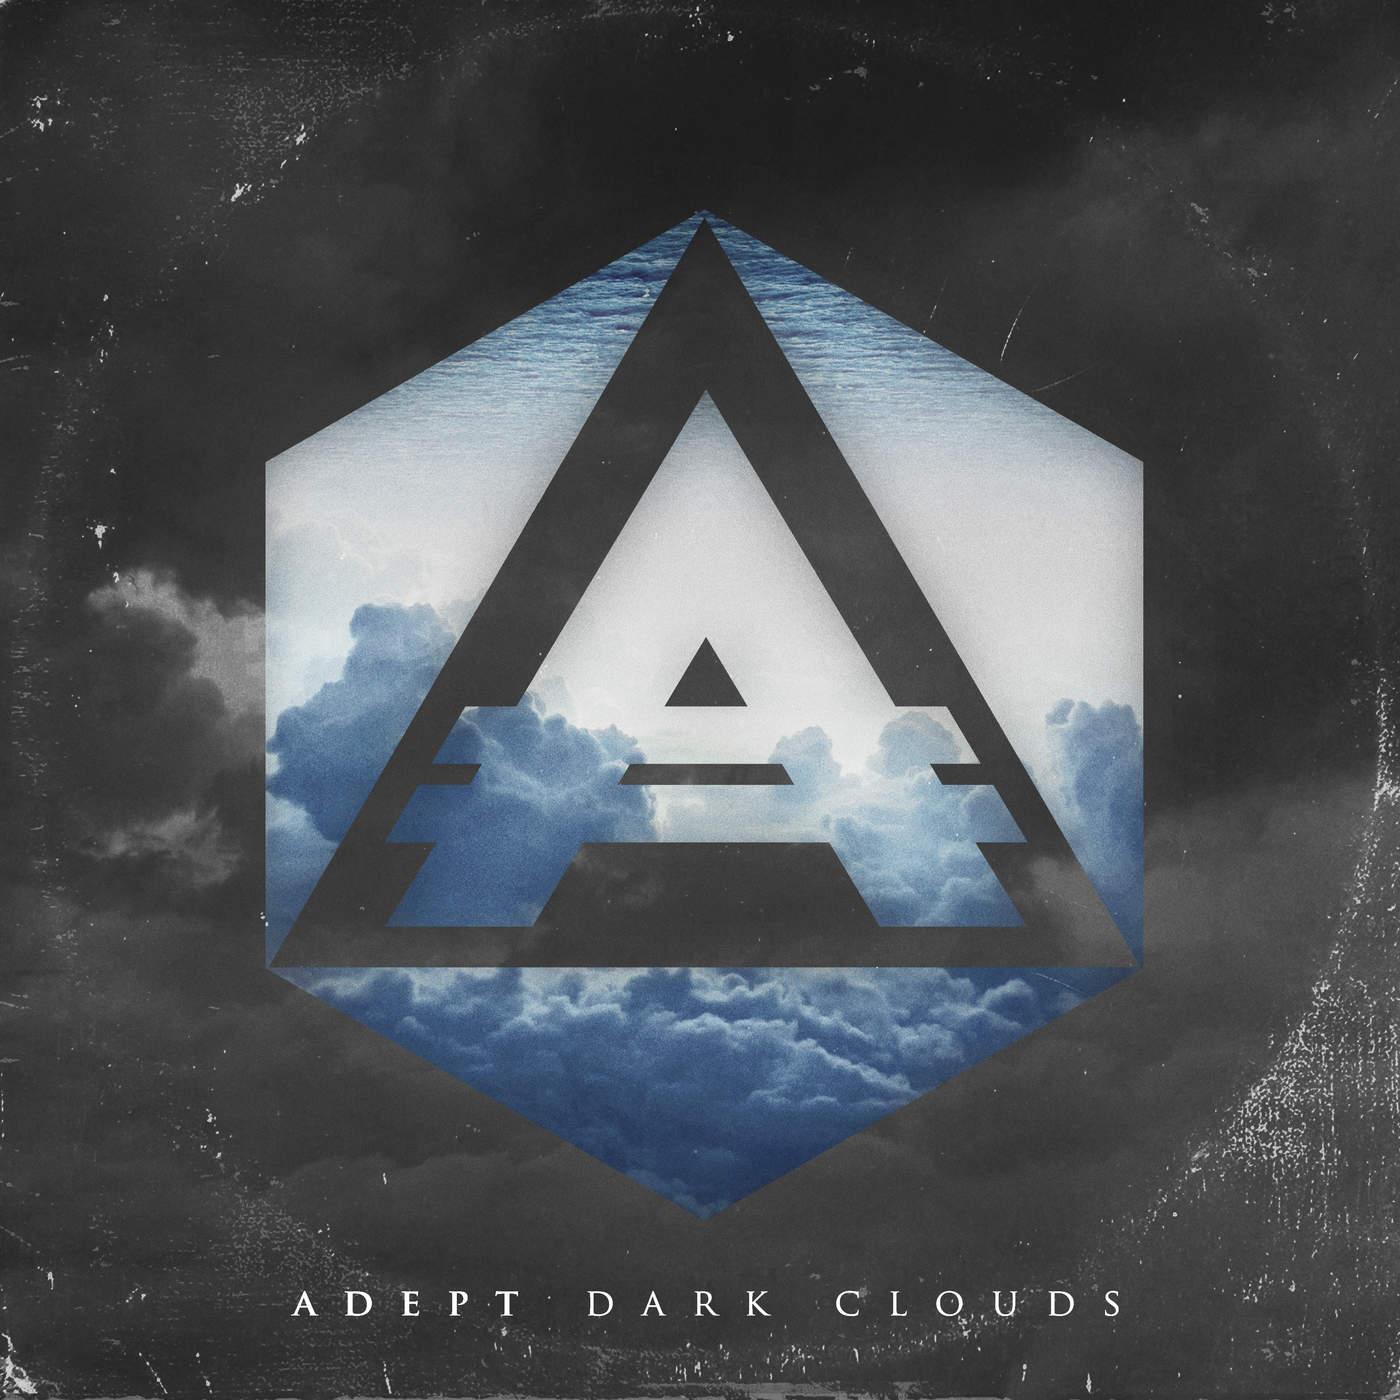 Adept - Dark Clouds [single] (2015)